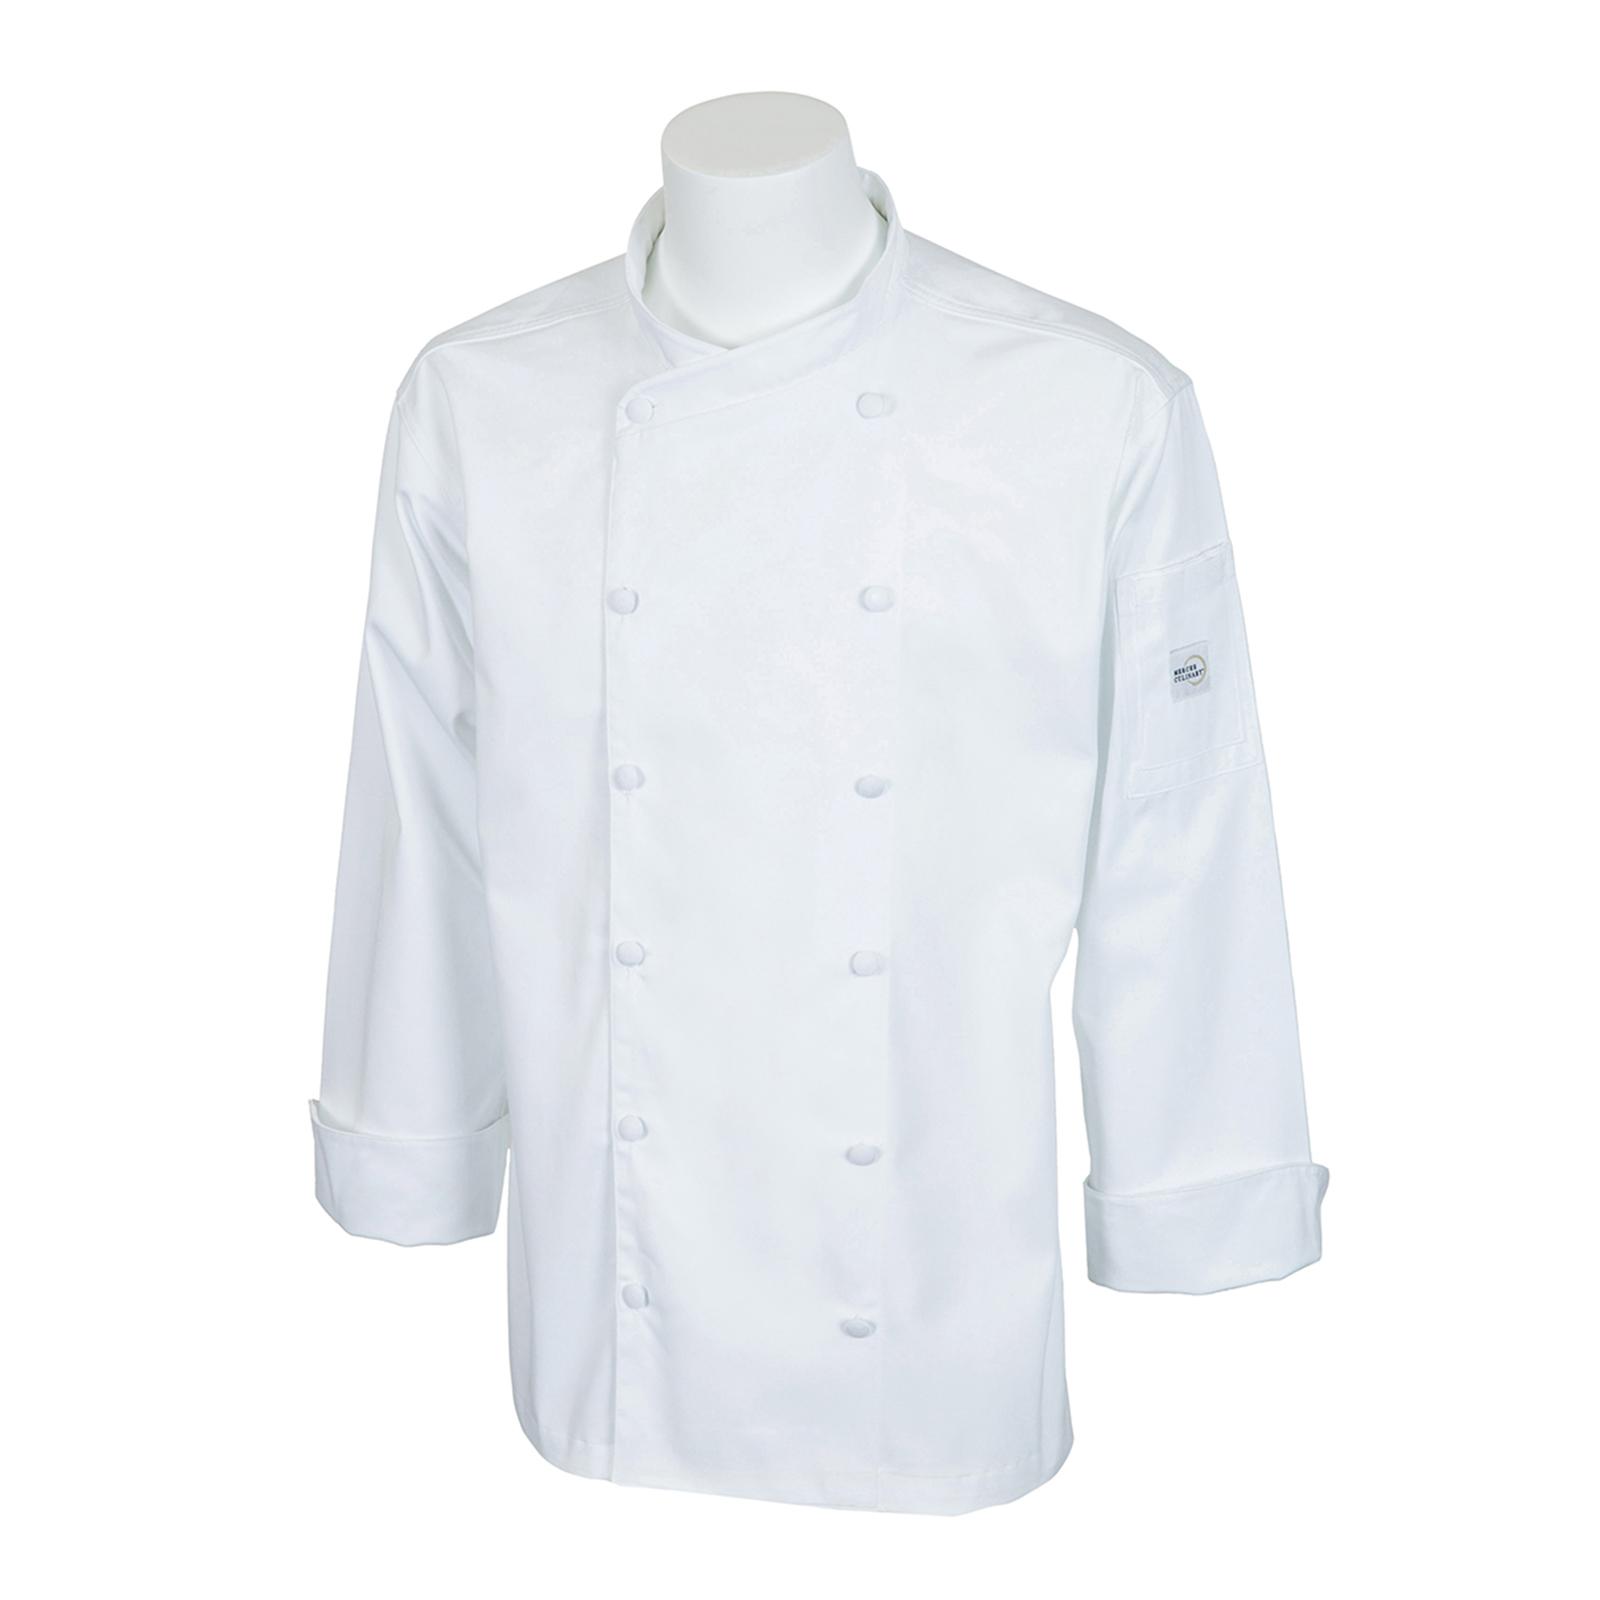 Mercer Culinary M62010WHXS chef's coat